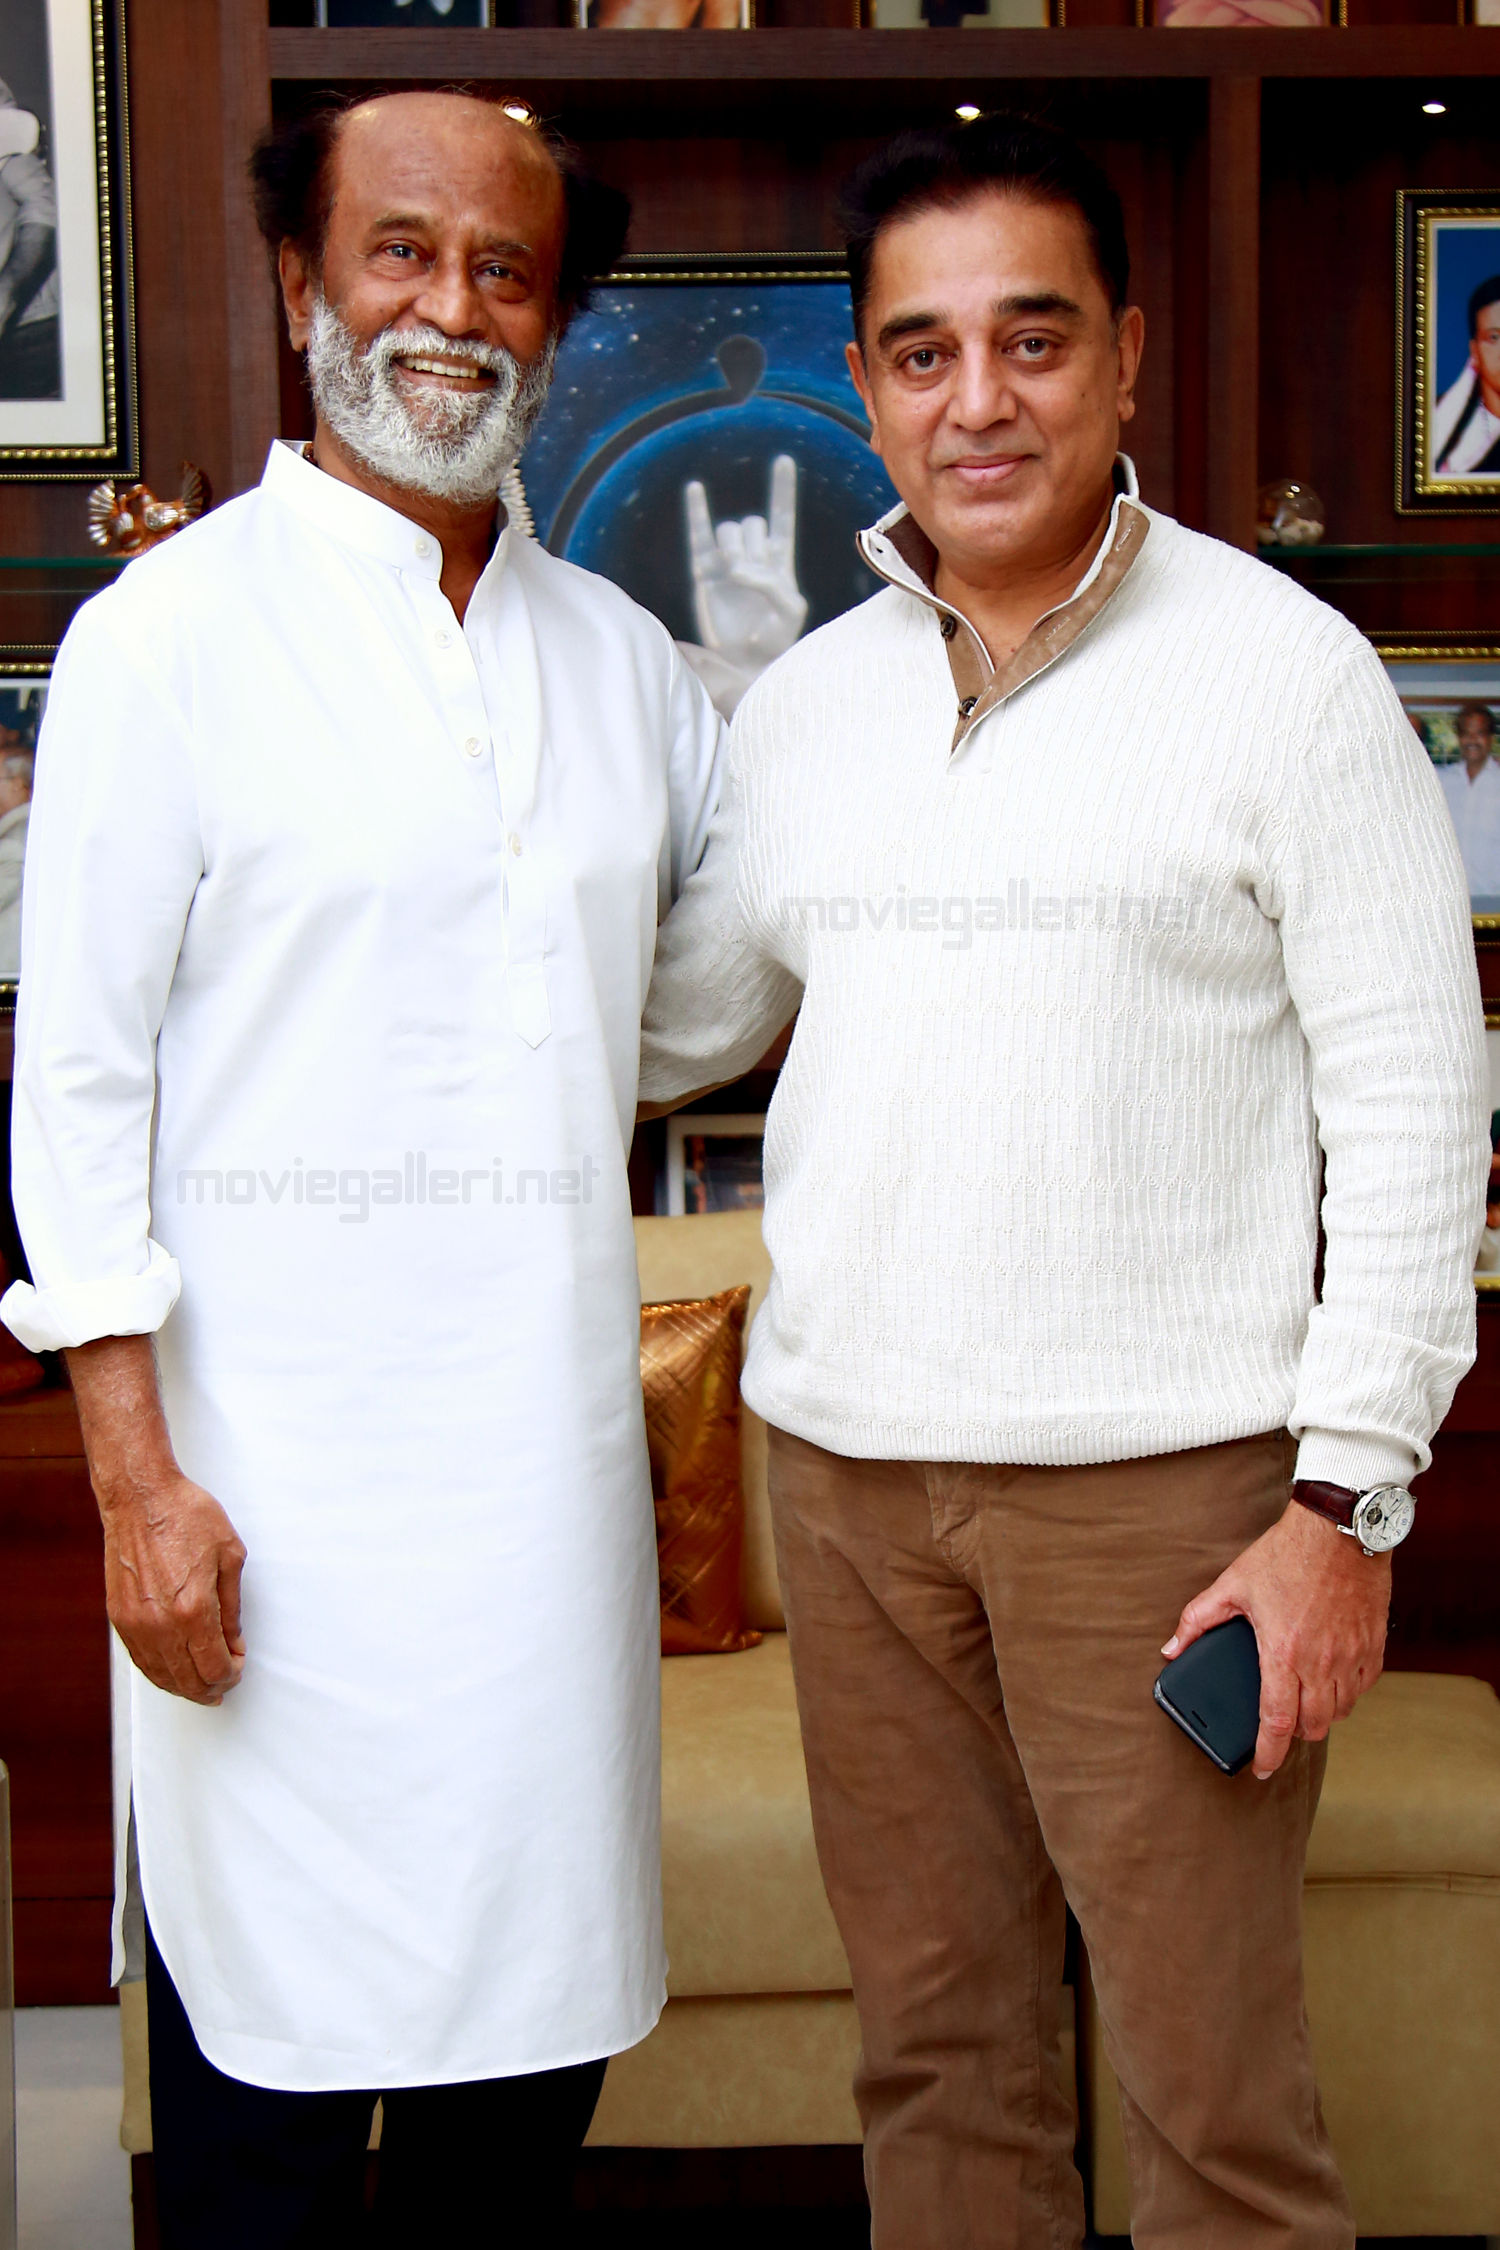 Kamal Haasan meets Rajinikanth in Chennai ahead of starting his political tour across Tamil Nadu